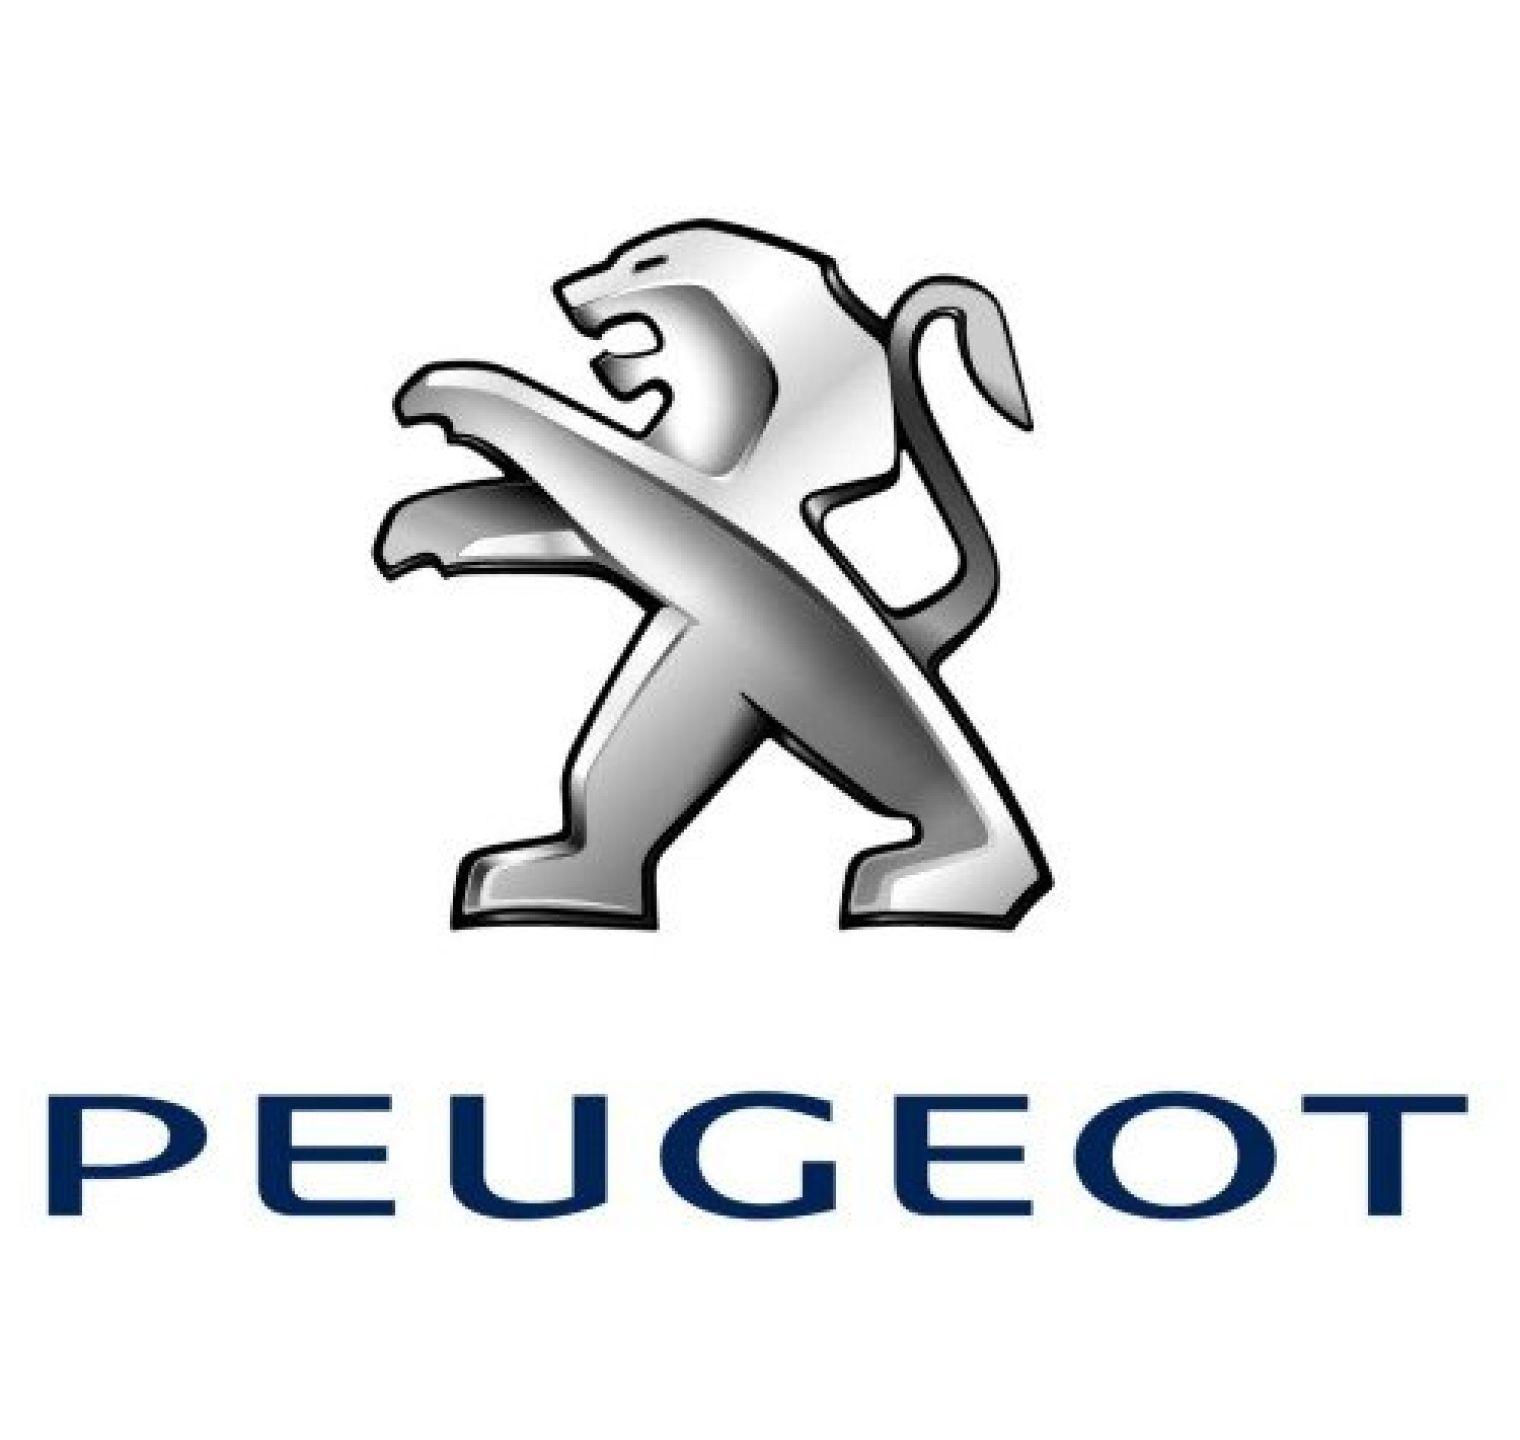 Peugeot 205 Hatchback/van (1990 t/m 1997) - set ruitenwissers Valeo Hydroconnect